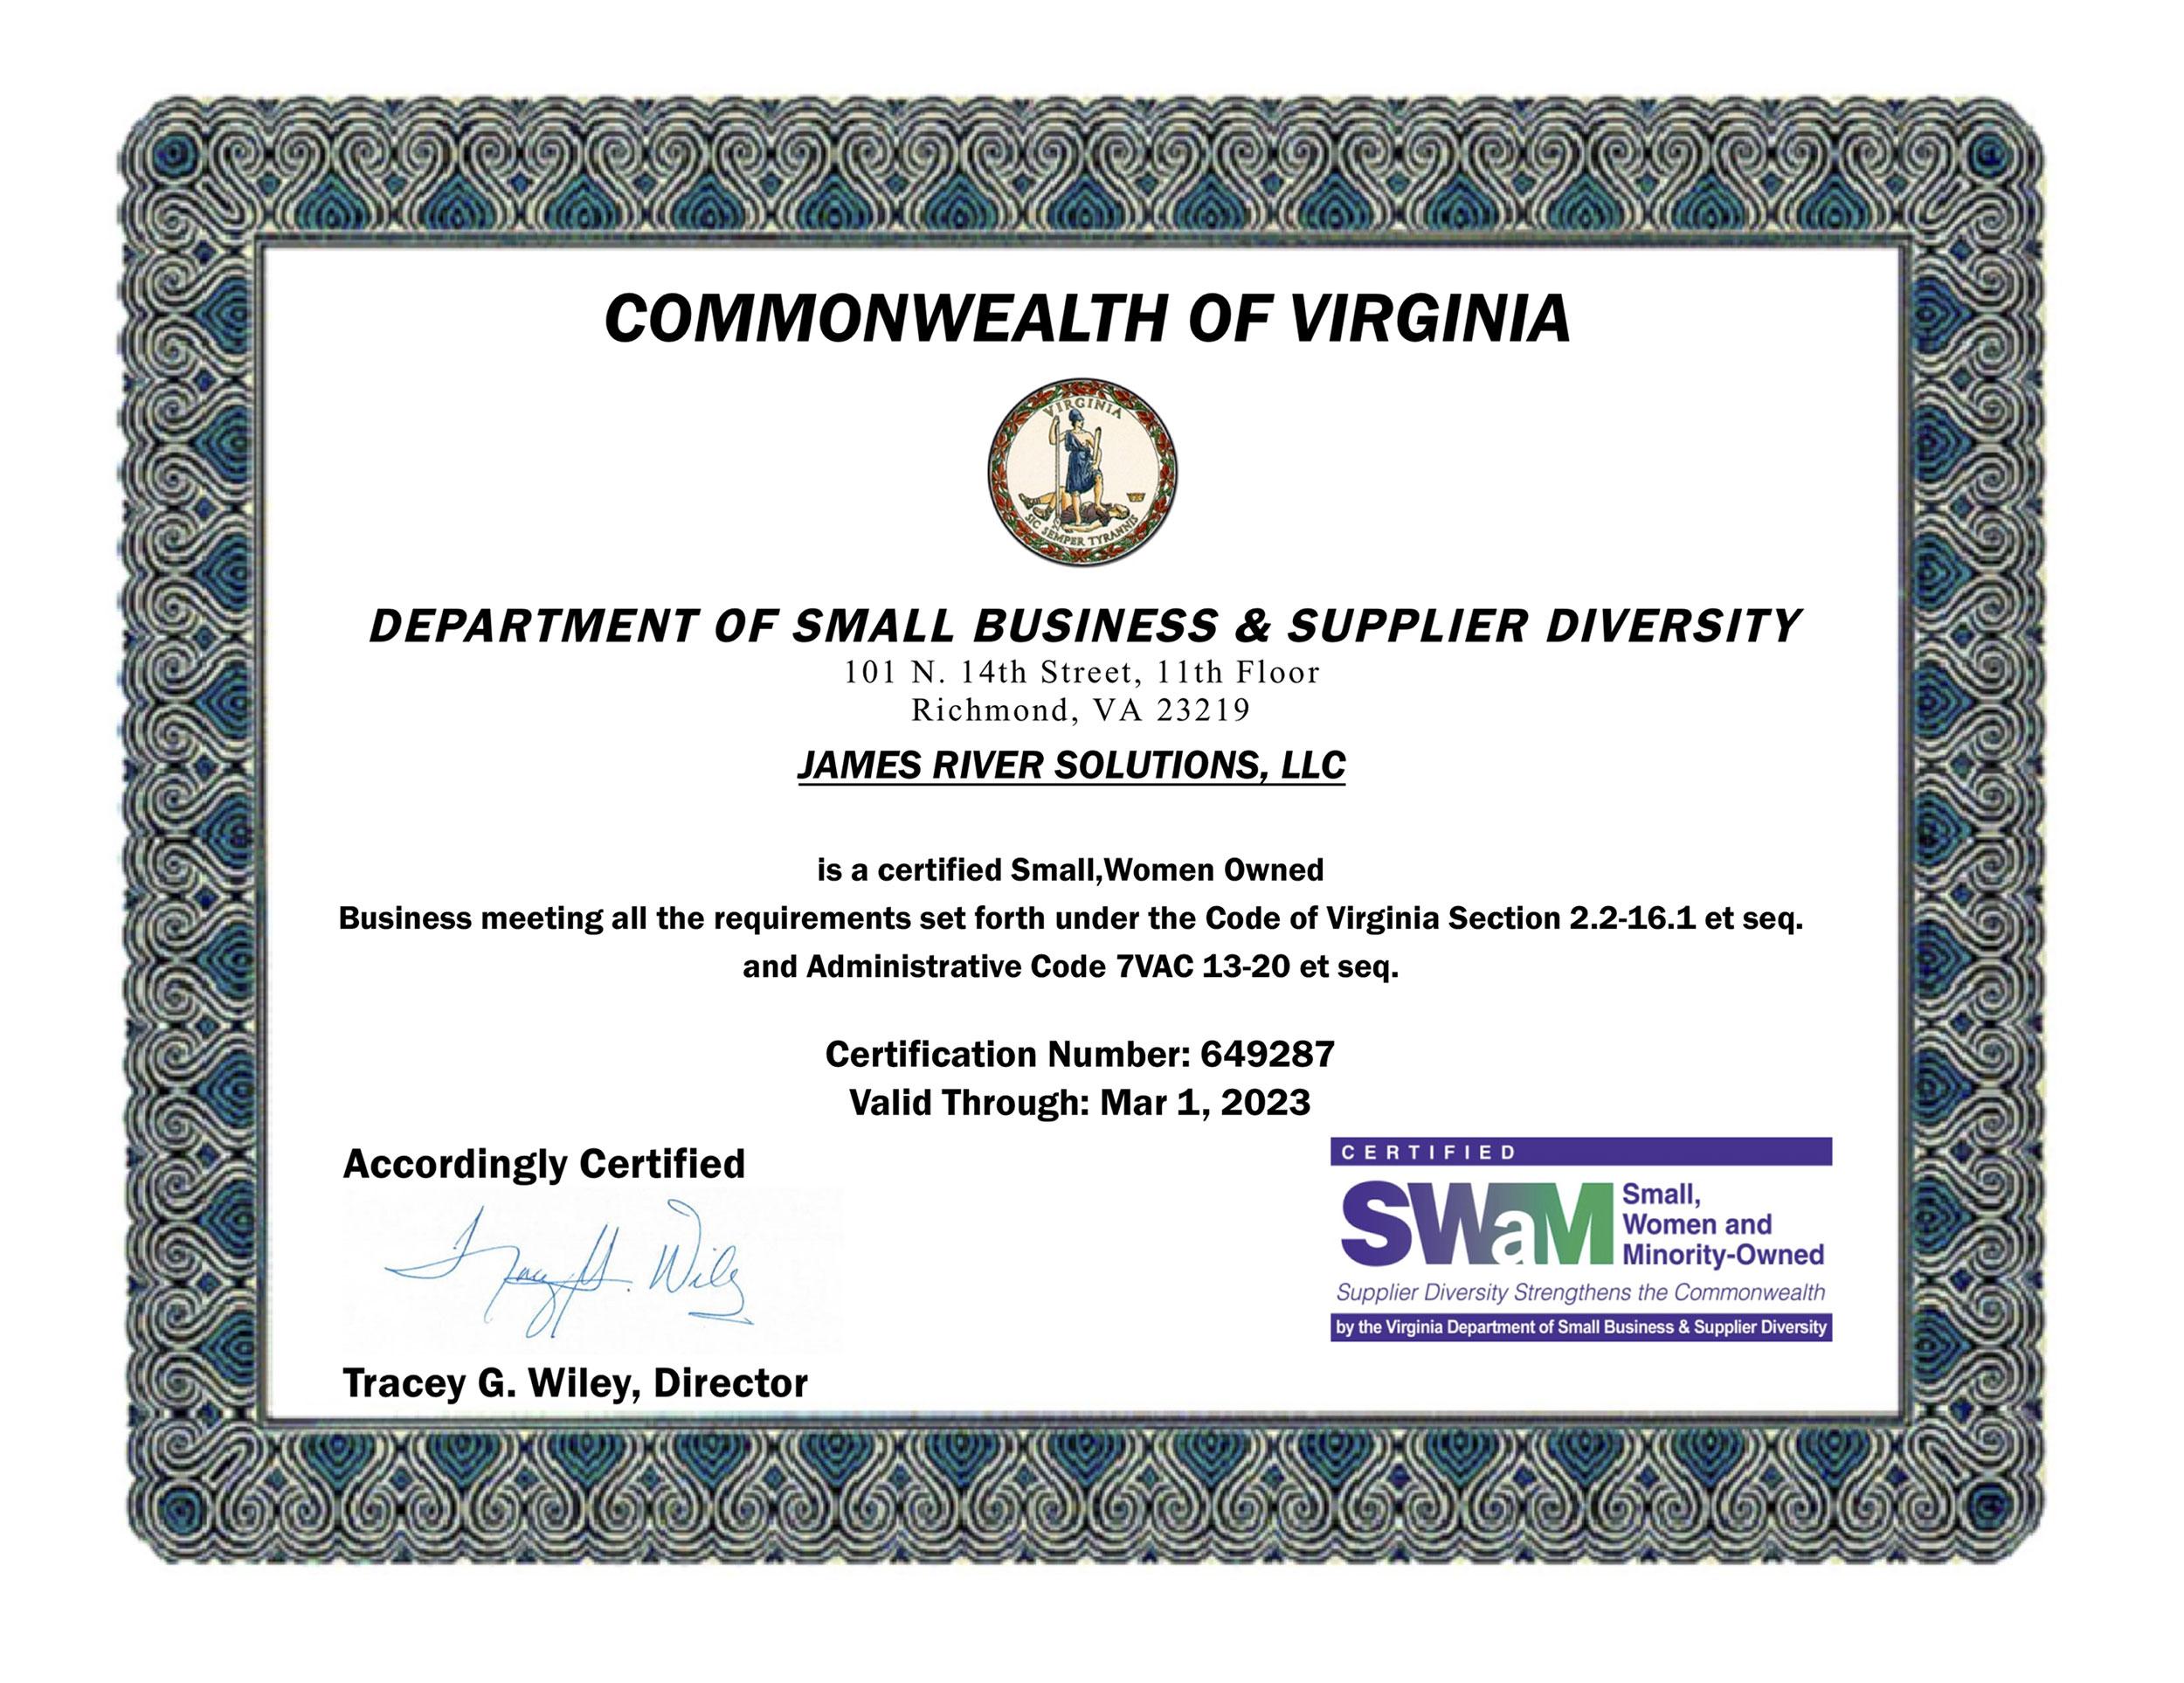 JRS SWaM Certificate